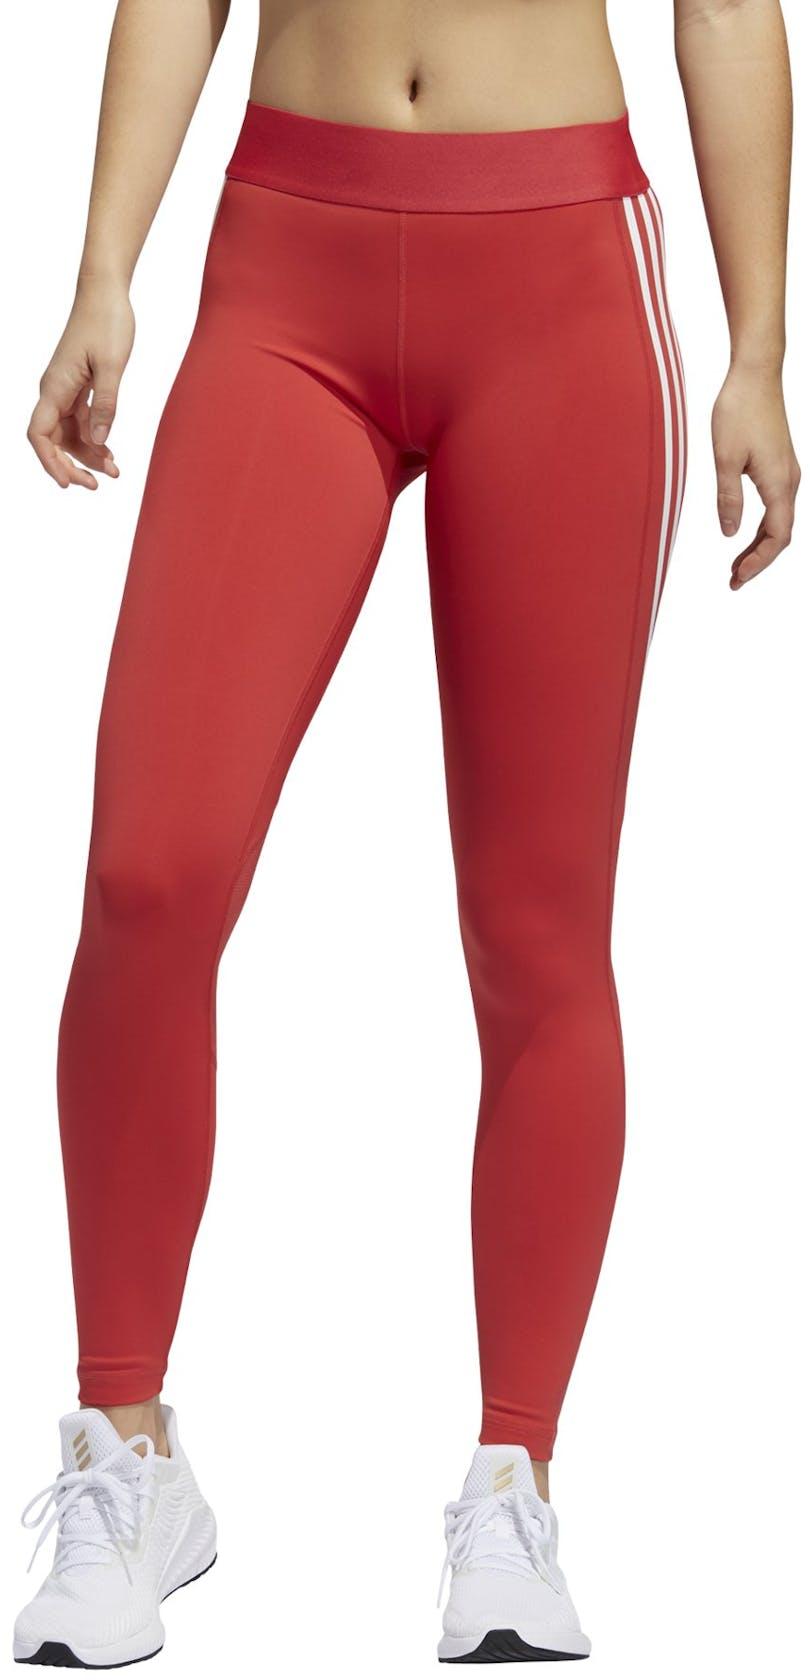 adidas Alphaskin Sport 3 Stripe - pantaloni fitness - donna